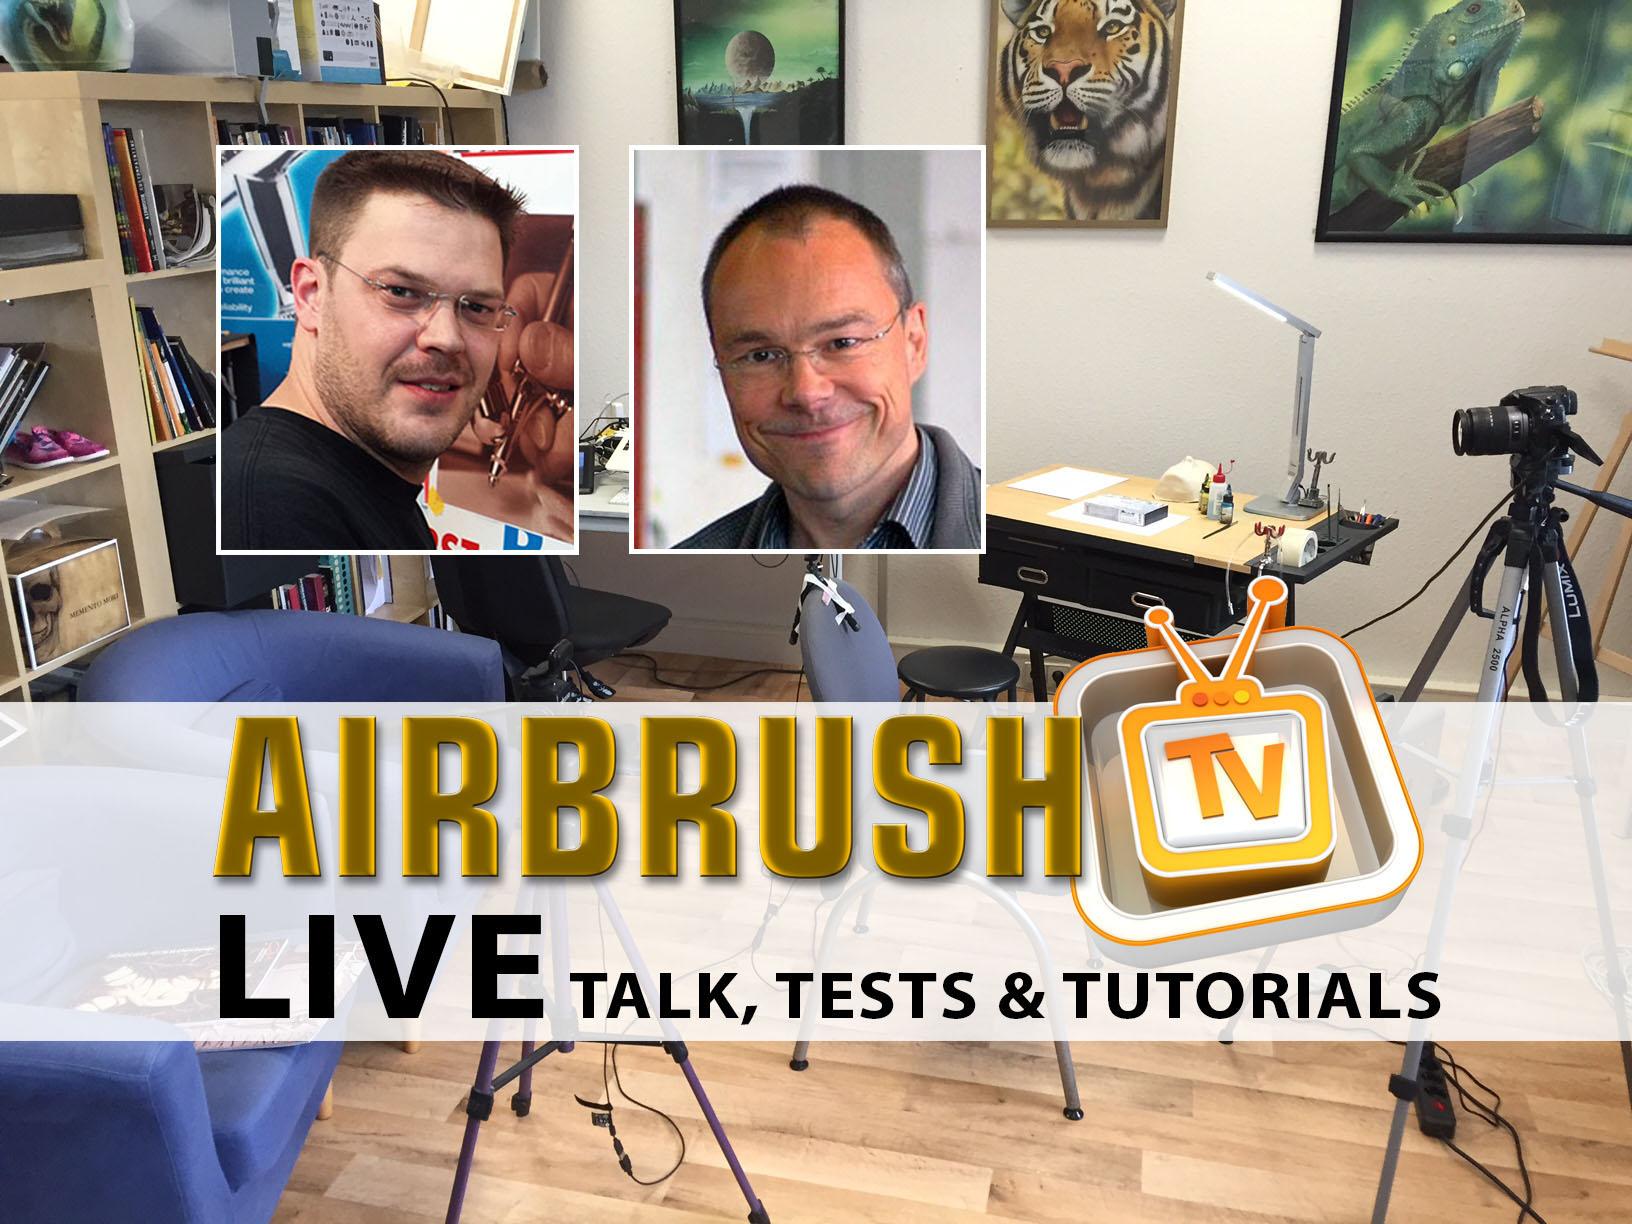 Airbrush TV Live am 20. Mai 19.00 Uhr